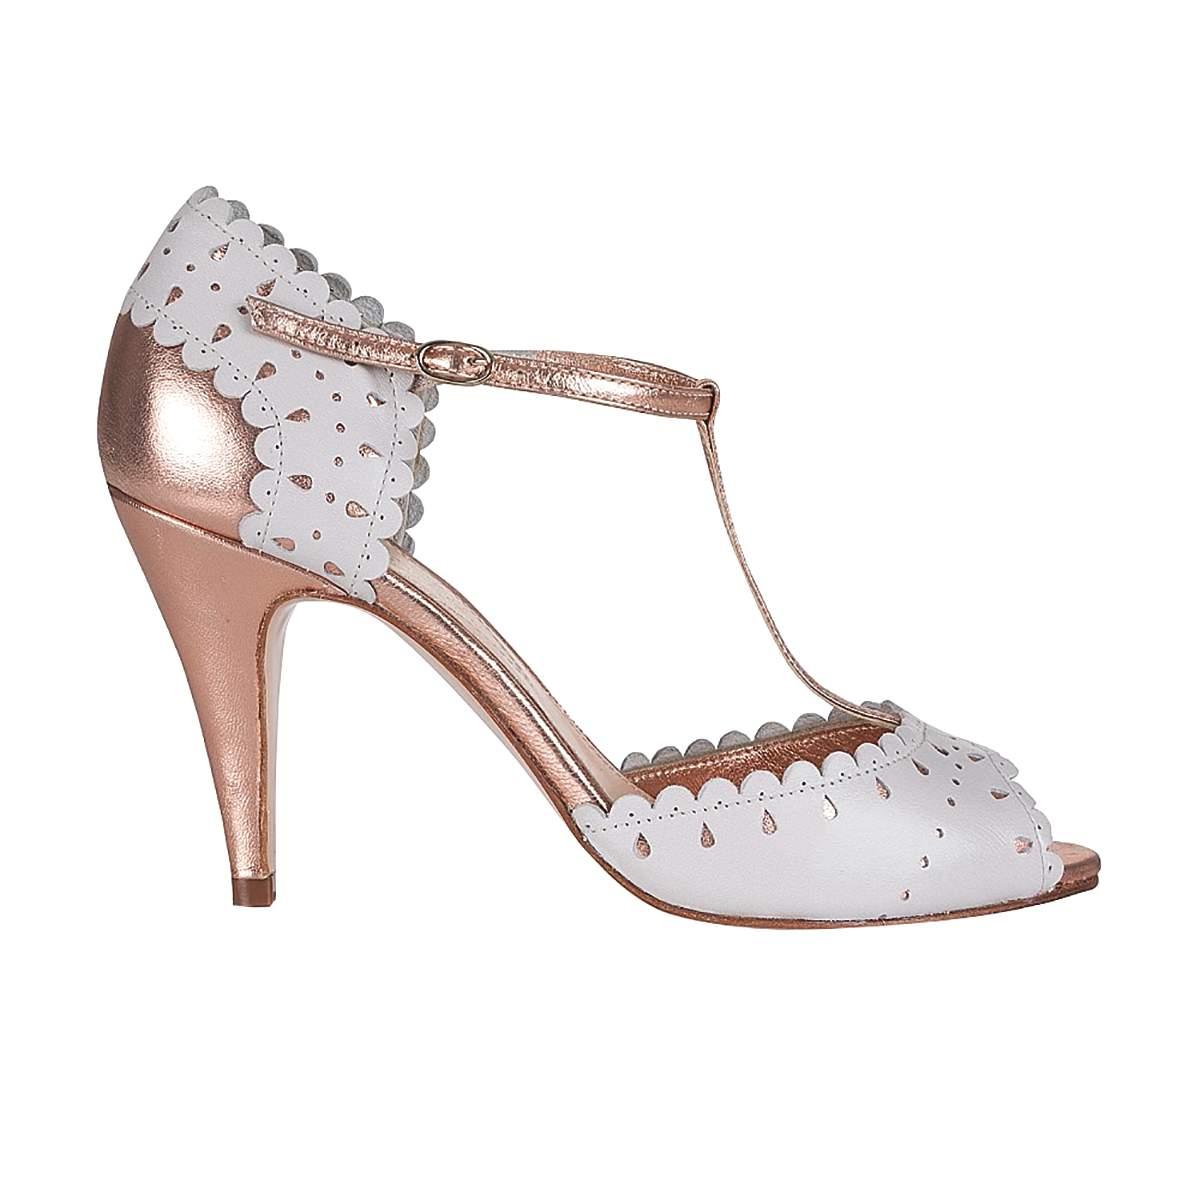 £175 rachelsimpsonshoes.co.uk